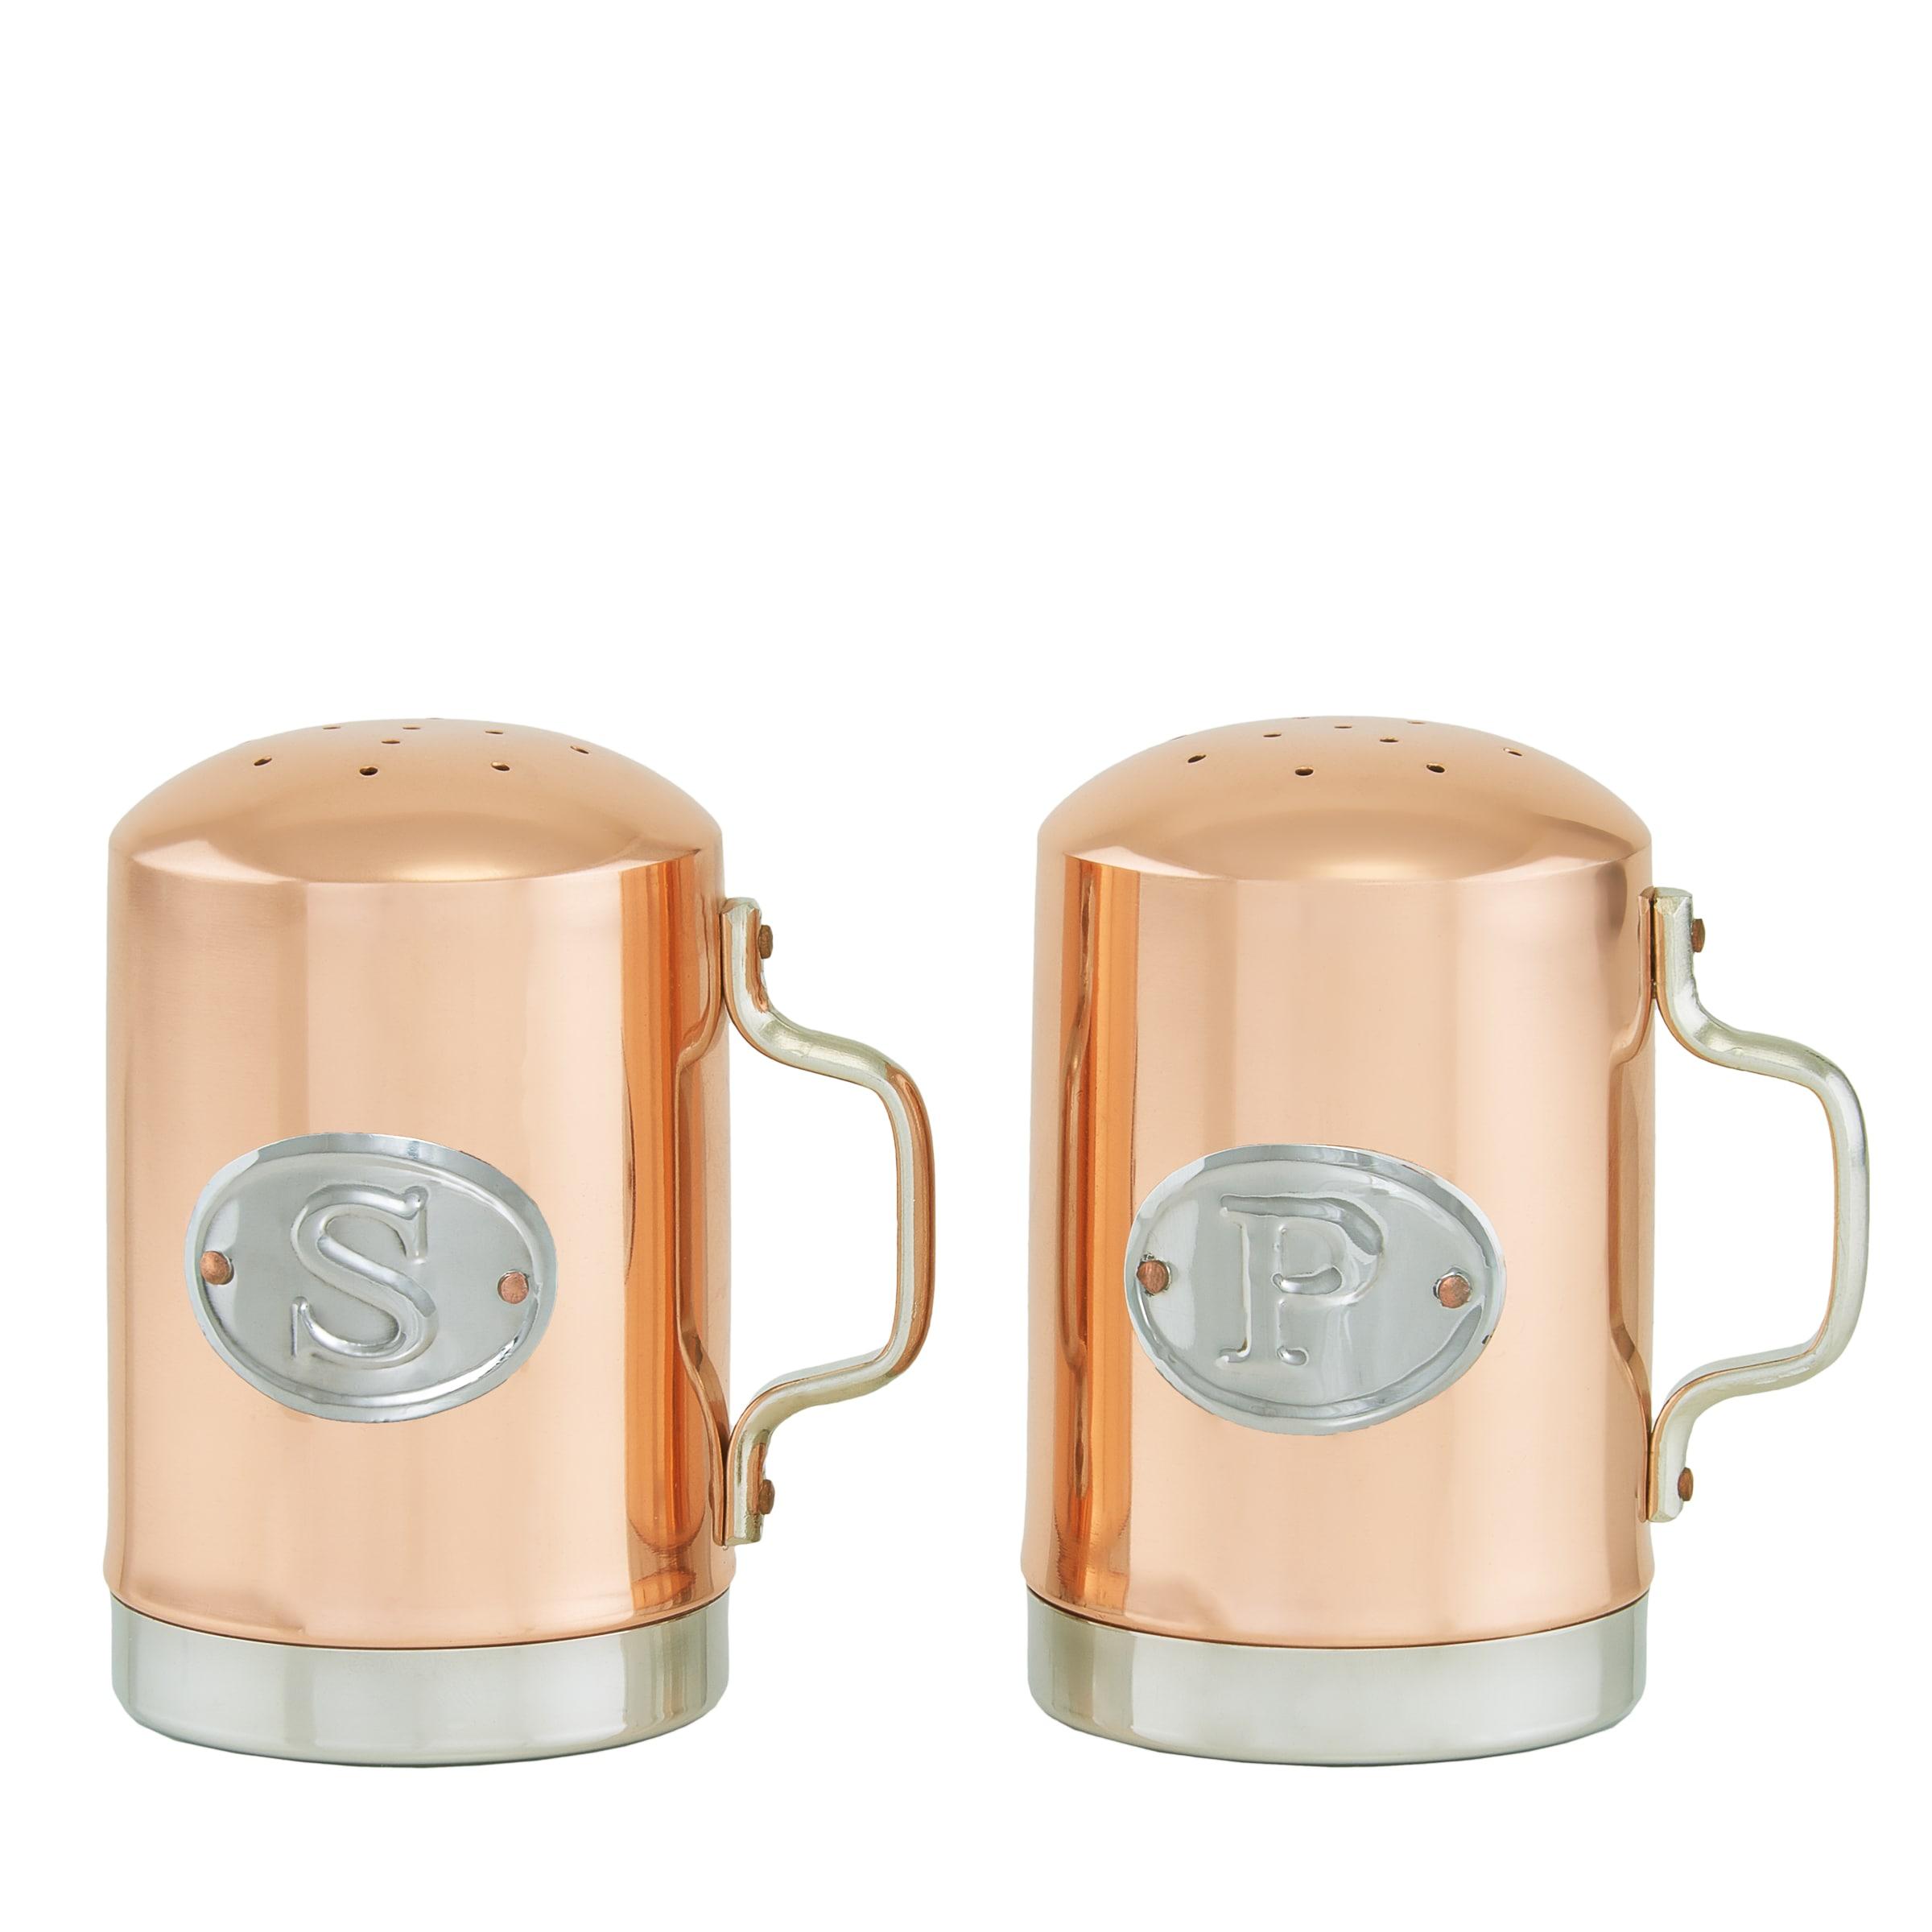 Old Dutch Decor Copper 4.25-inch Stovetop Salt and Pepper Shaker Set